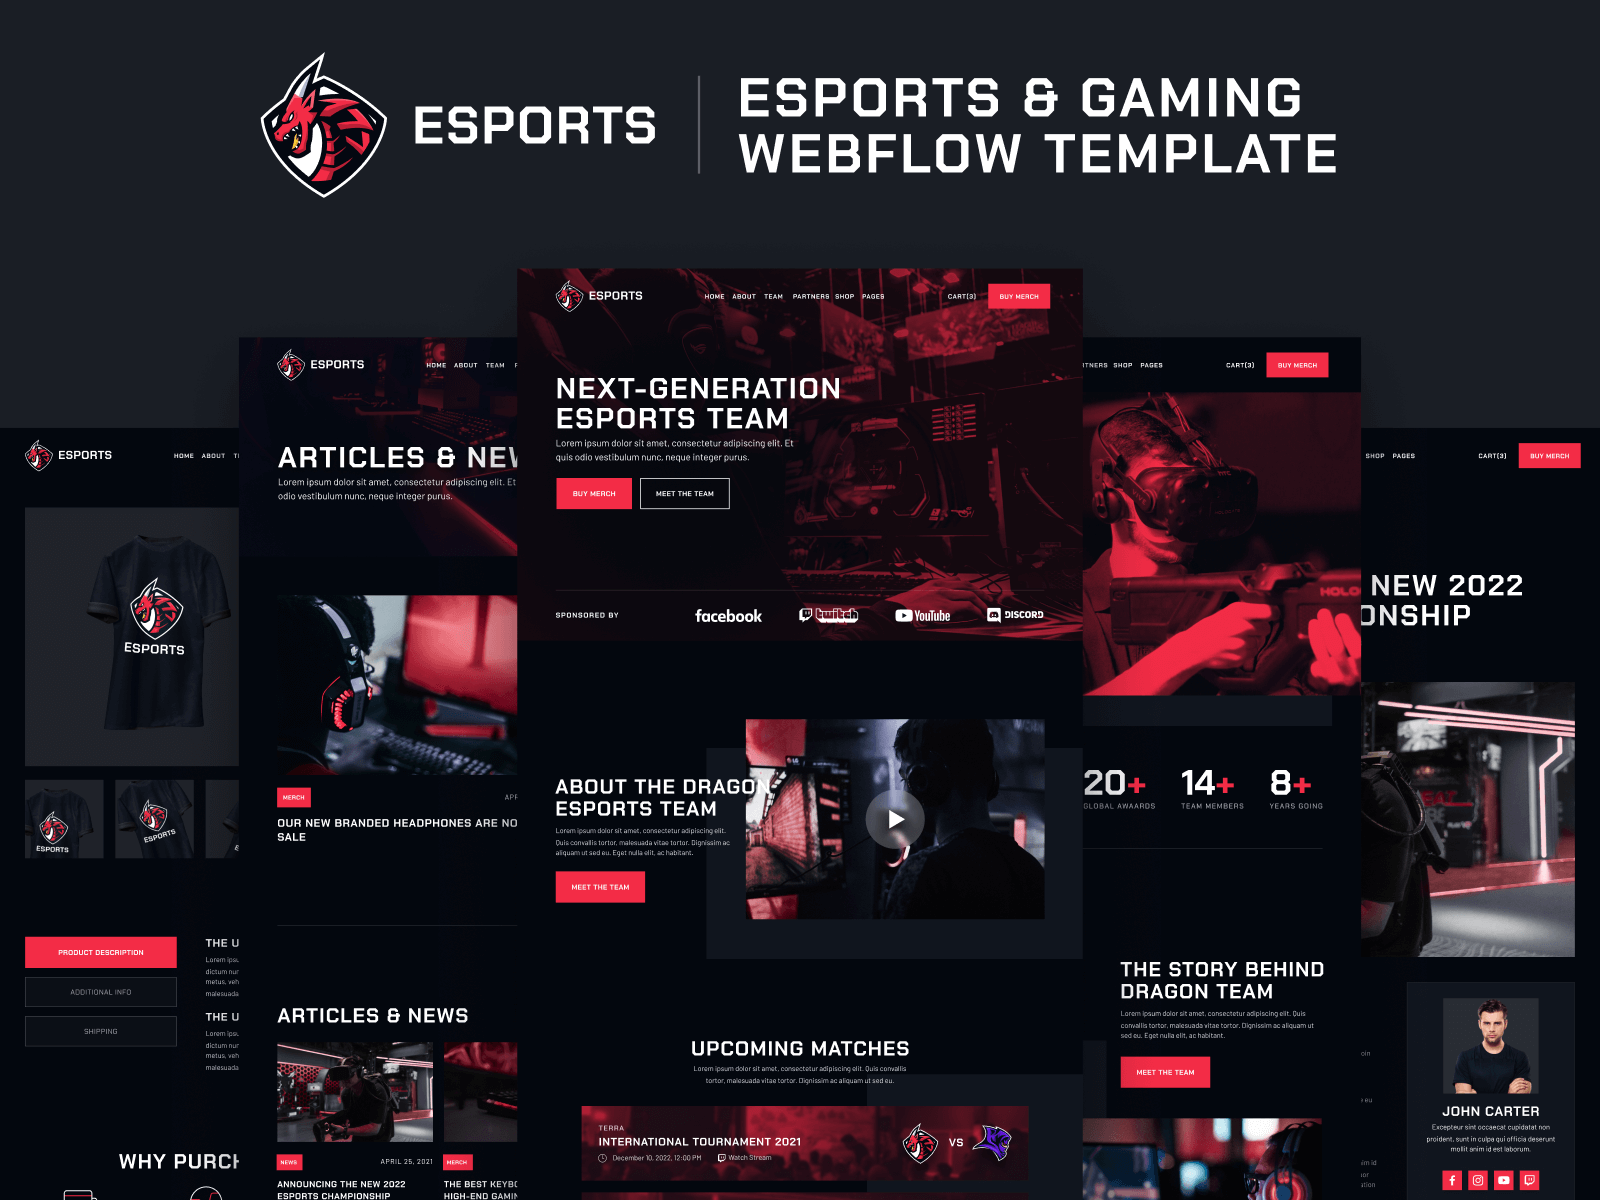 eSports & Gaming Webflow Template